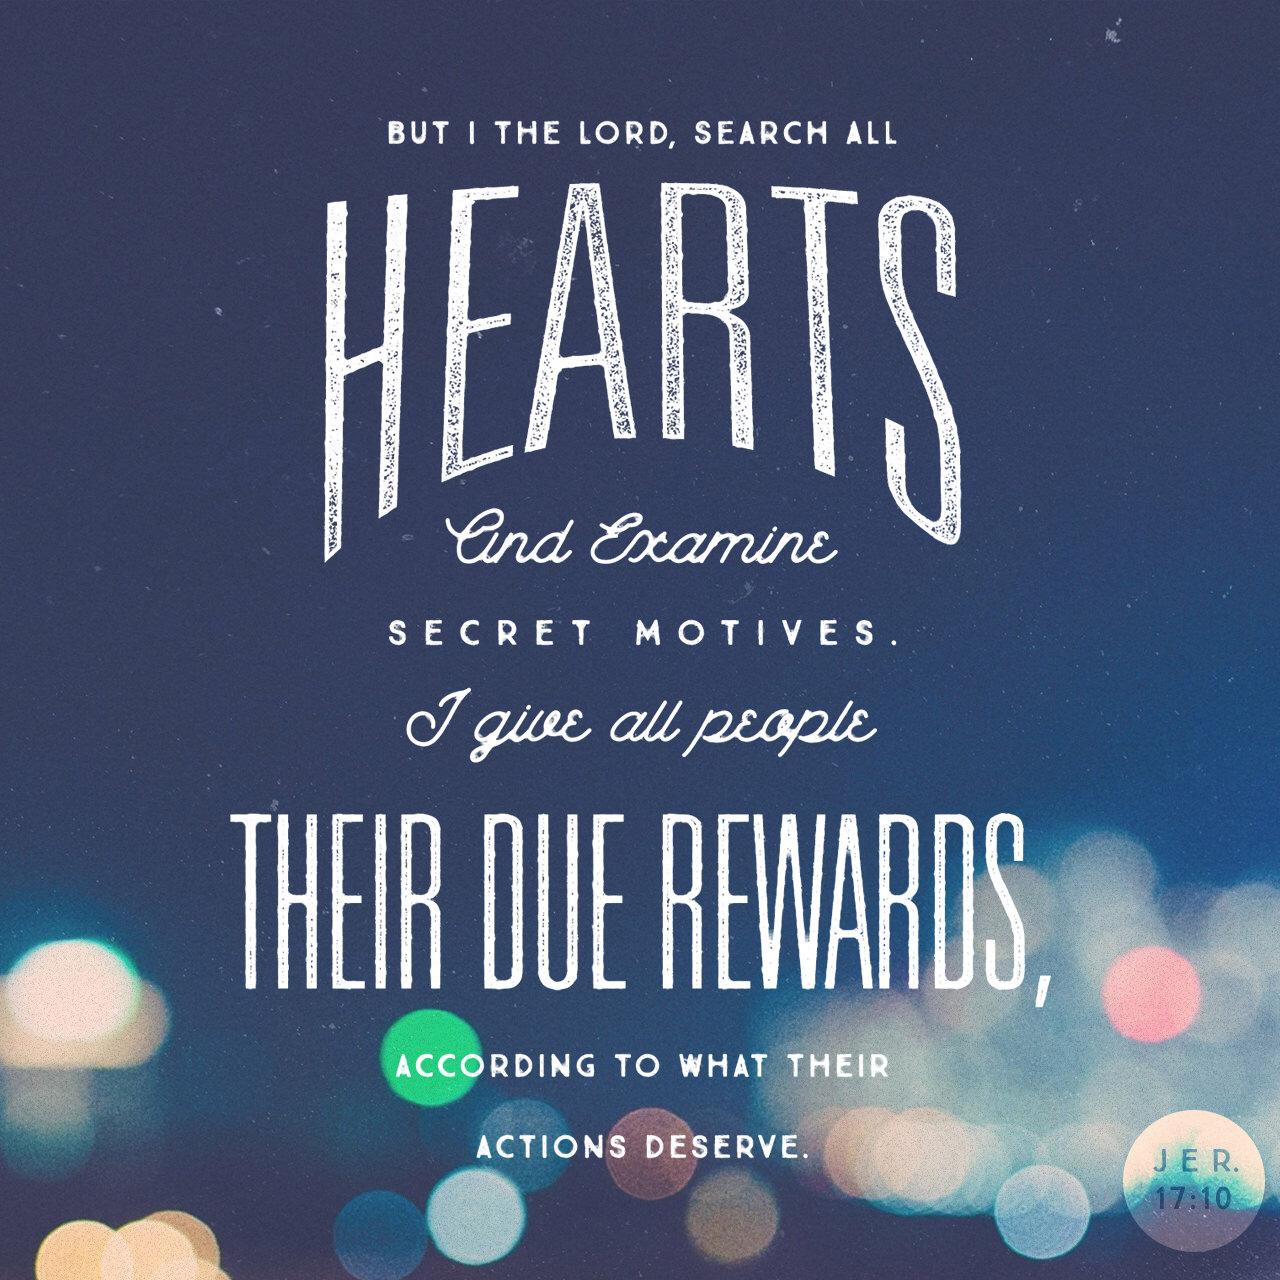 Get Your Due Rewards